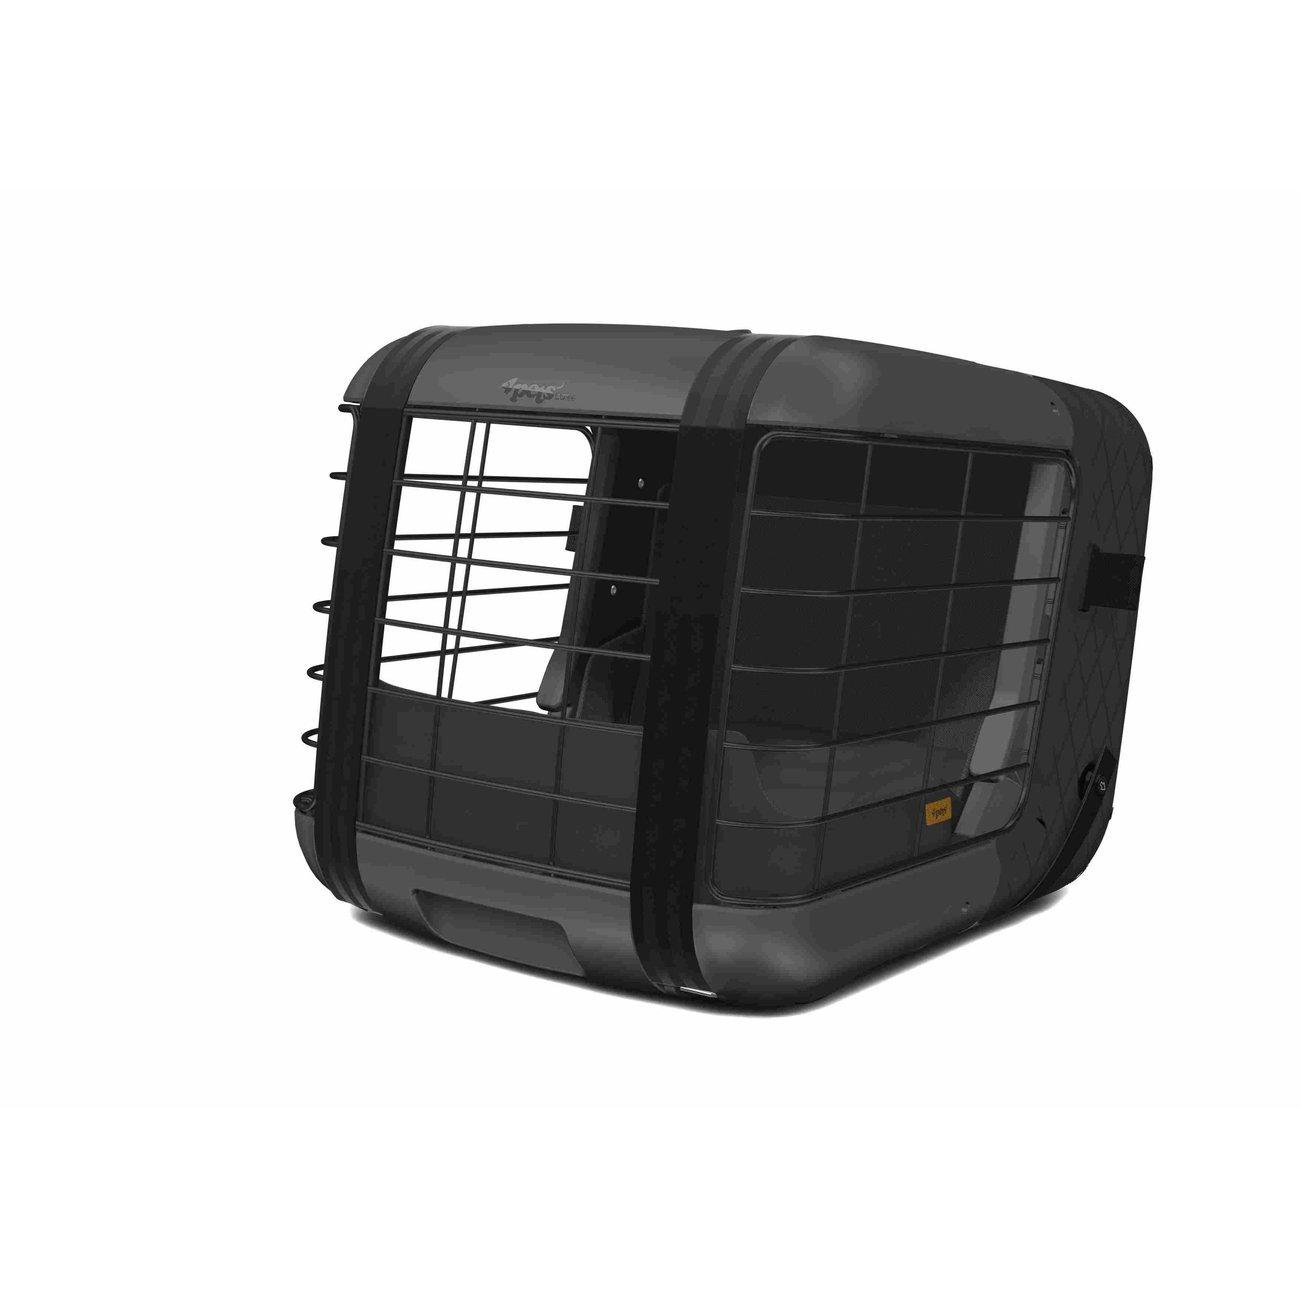 4pets Dog Caree Hundebox Transportbox für Hunde, Bild 8